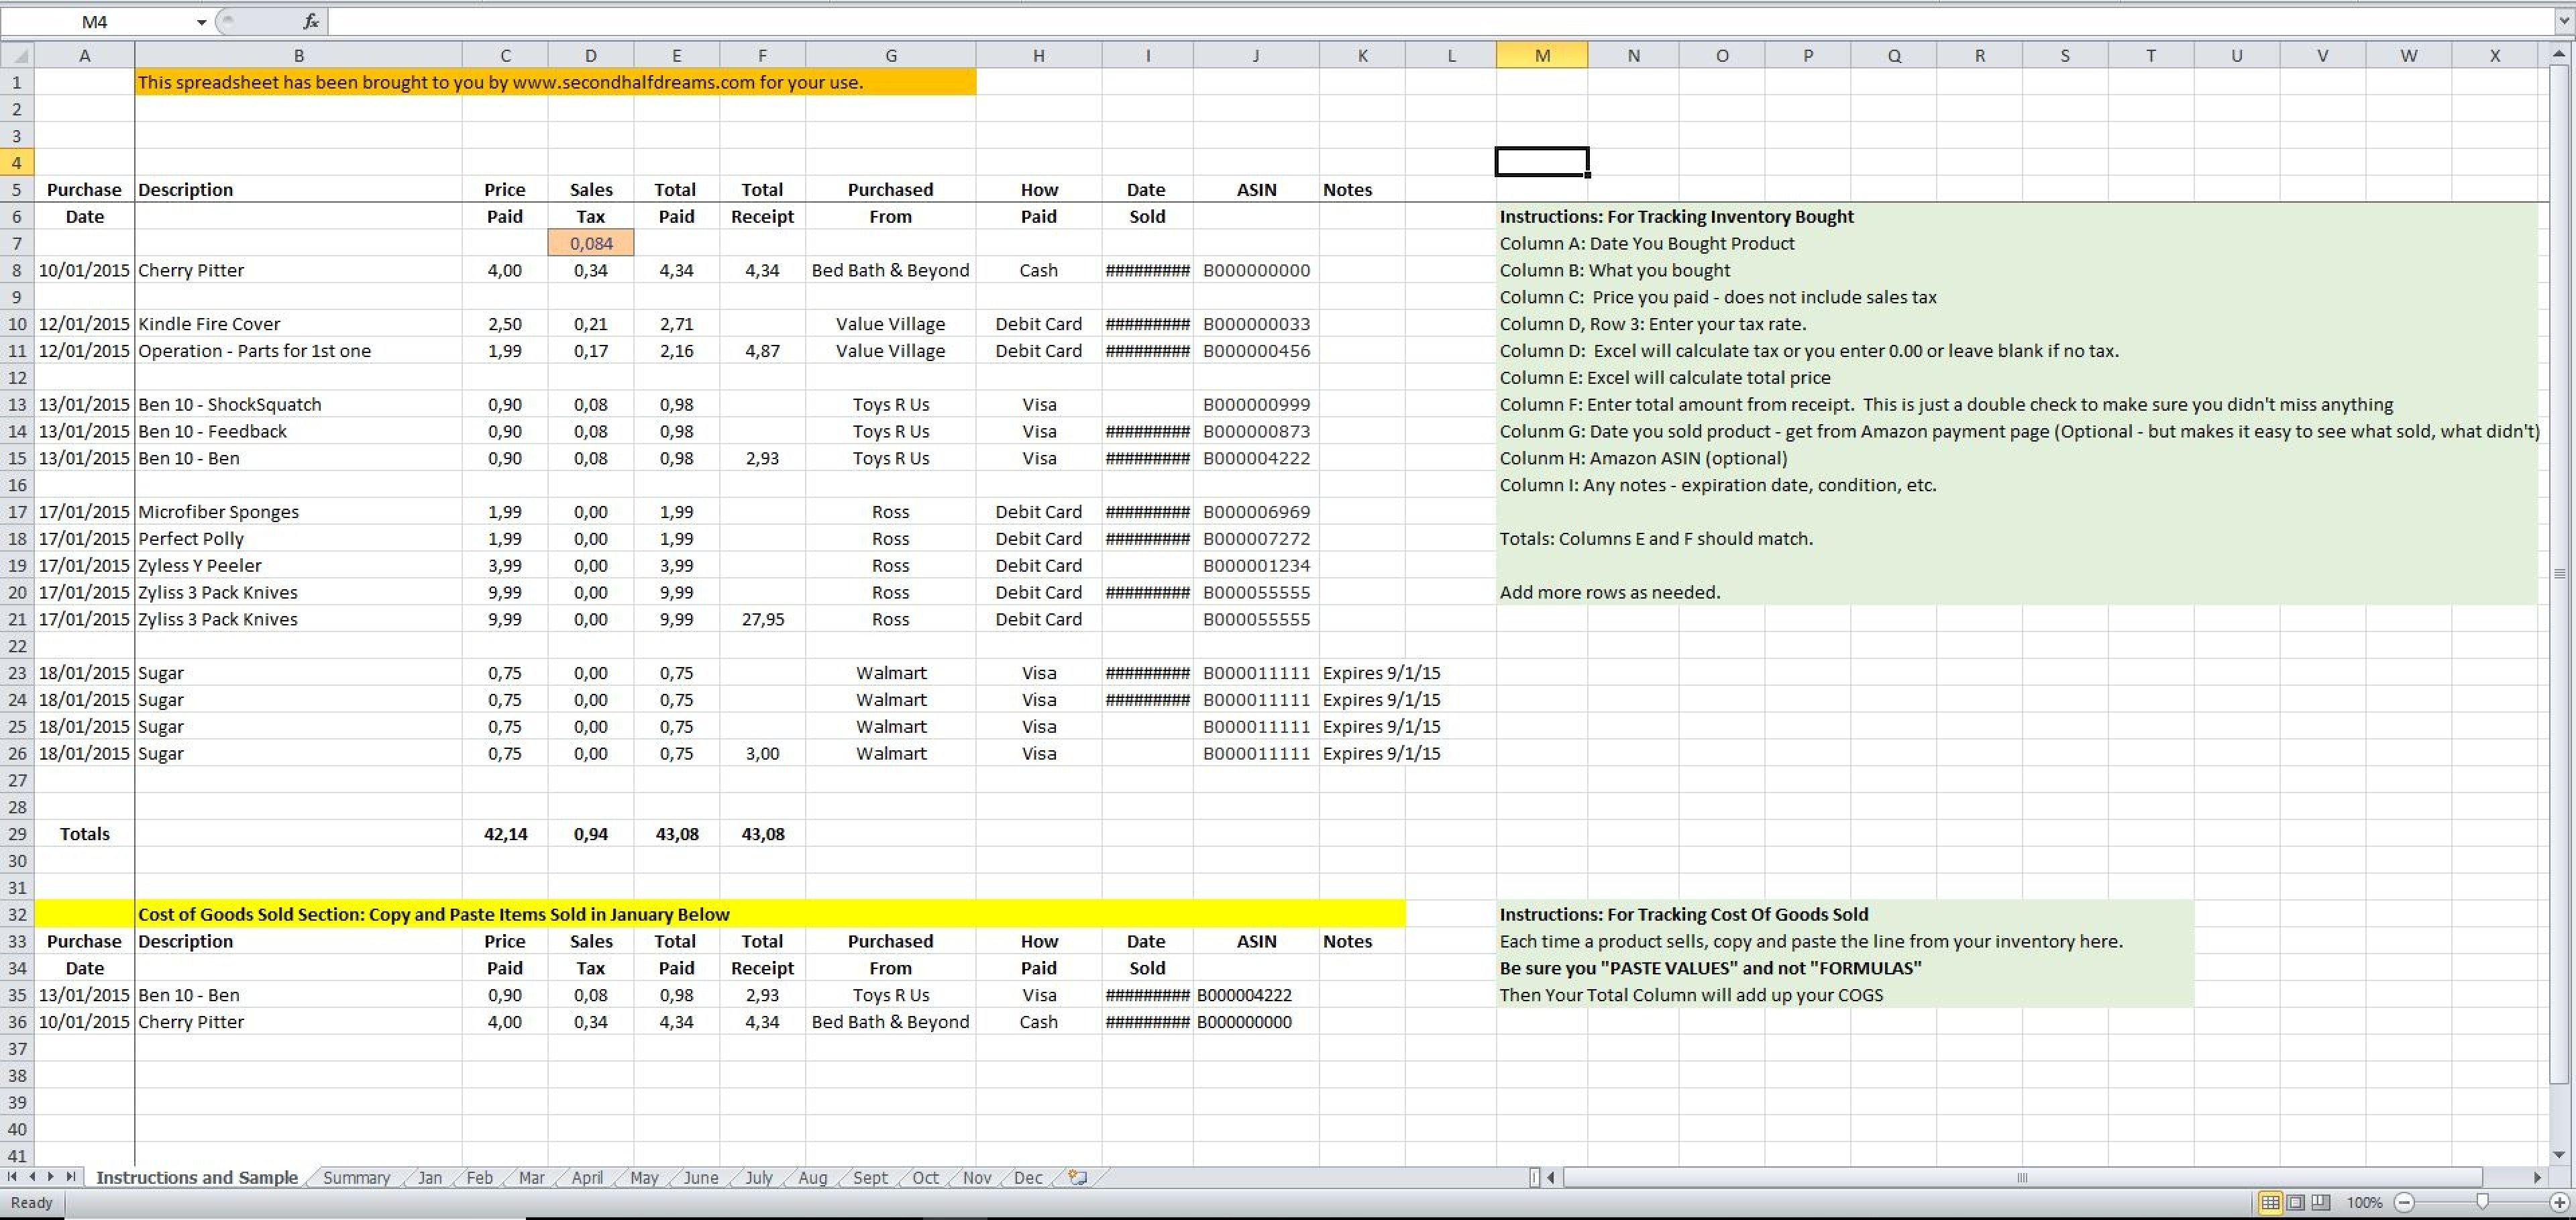 Cogs Spreadsheet Spreadsheet Downloa Cogs Spreadsheet